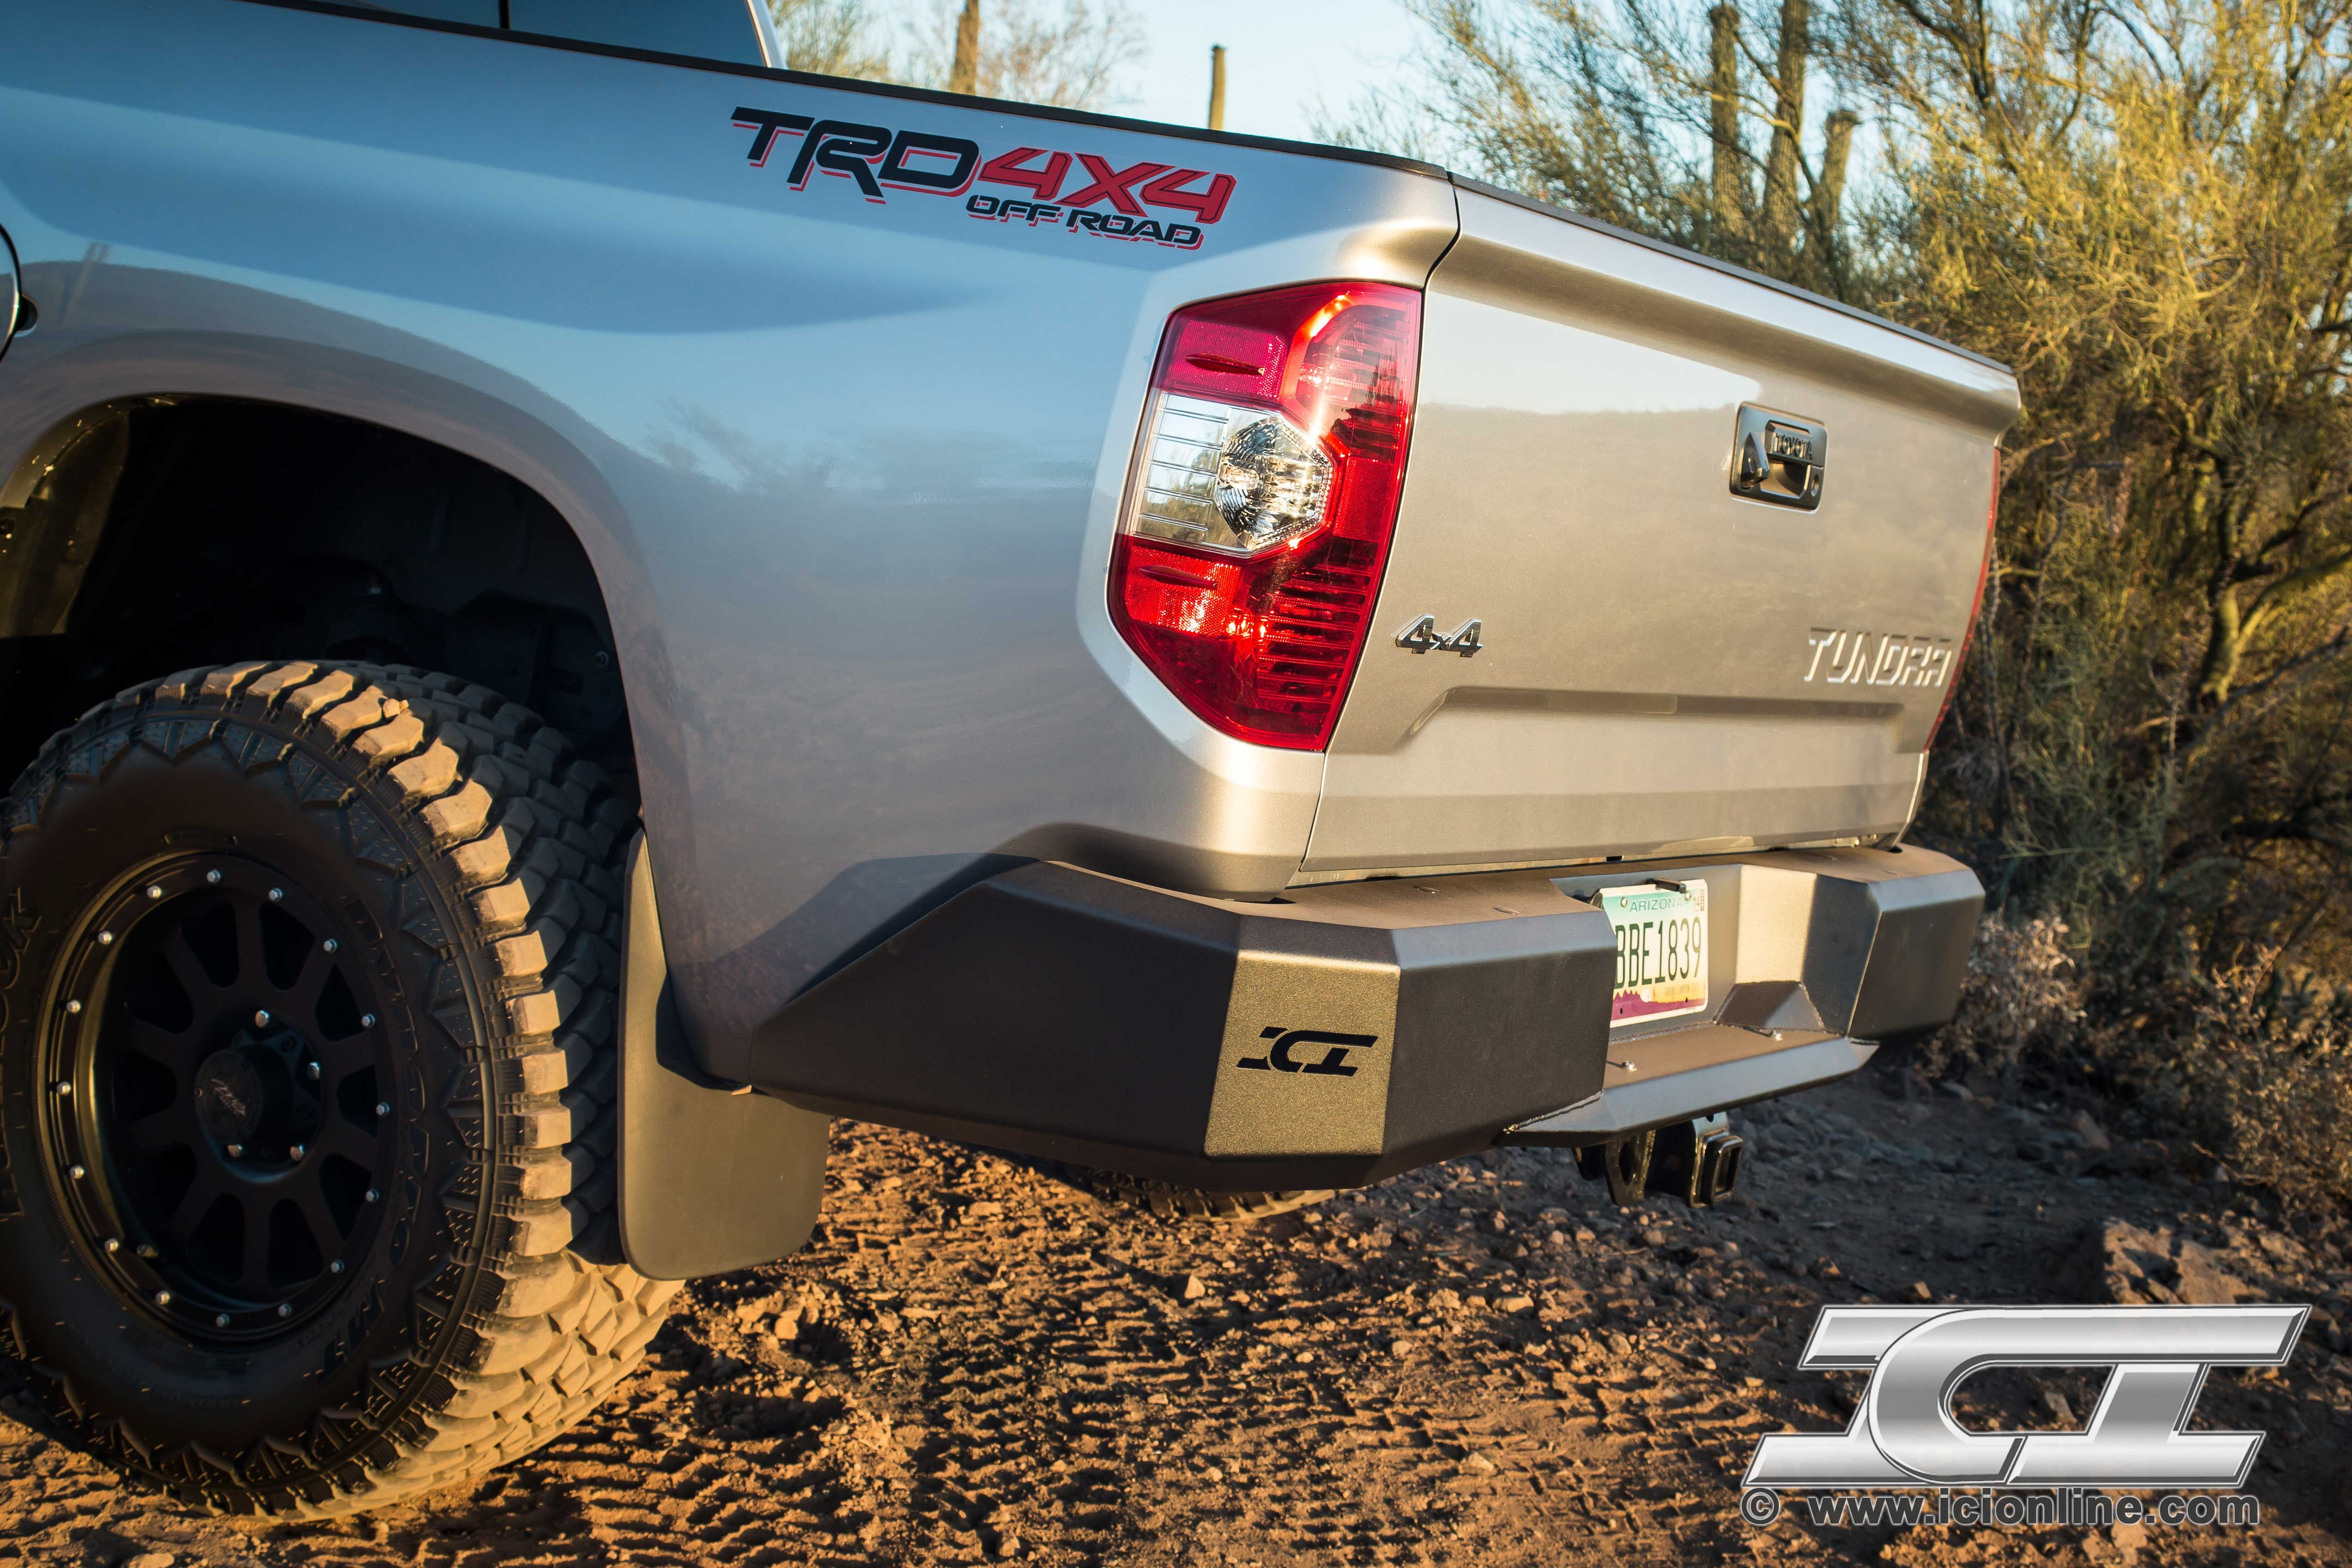 Magnum rear bumper for the 2014 toyota tundra part rbm69tyn